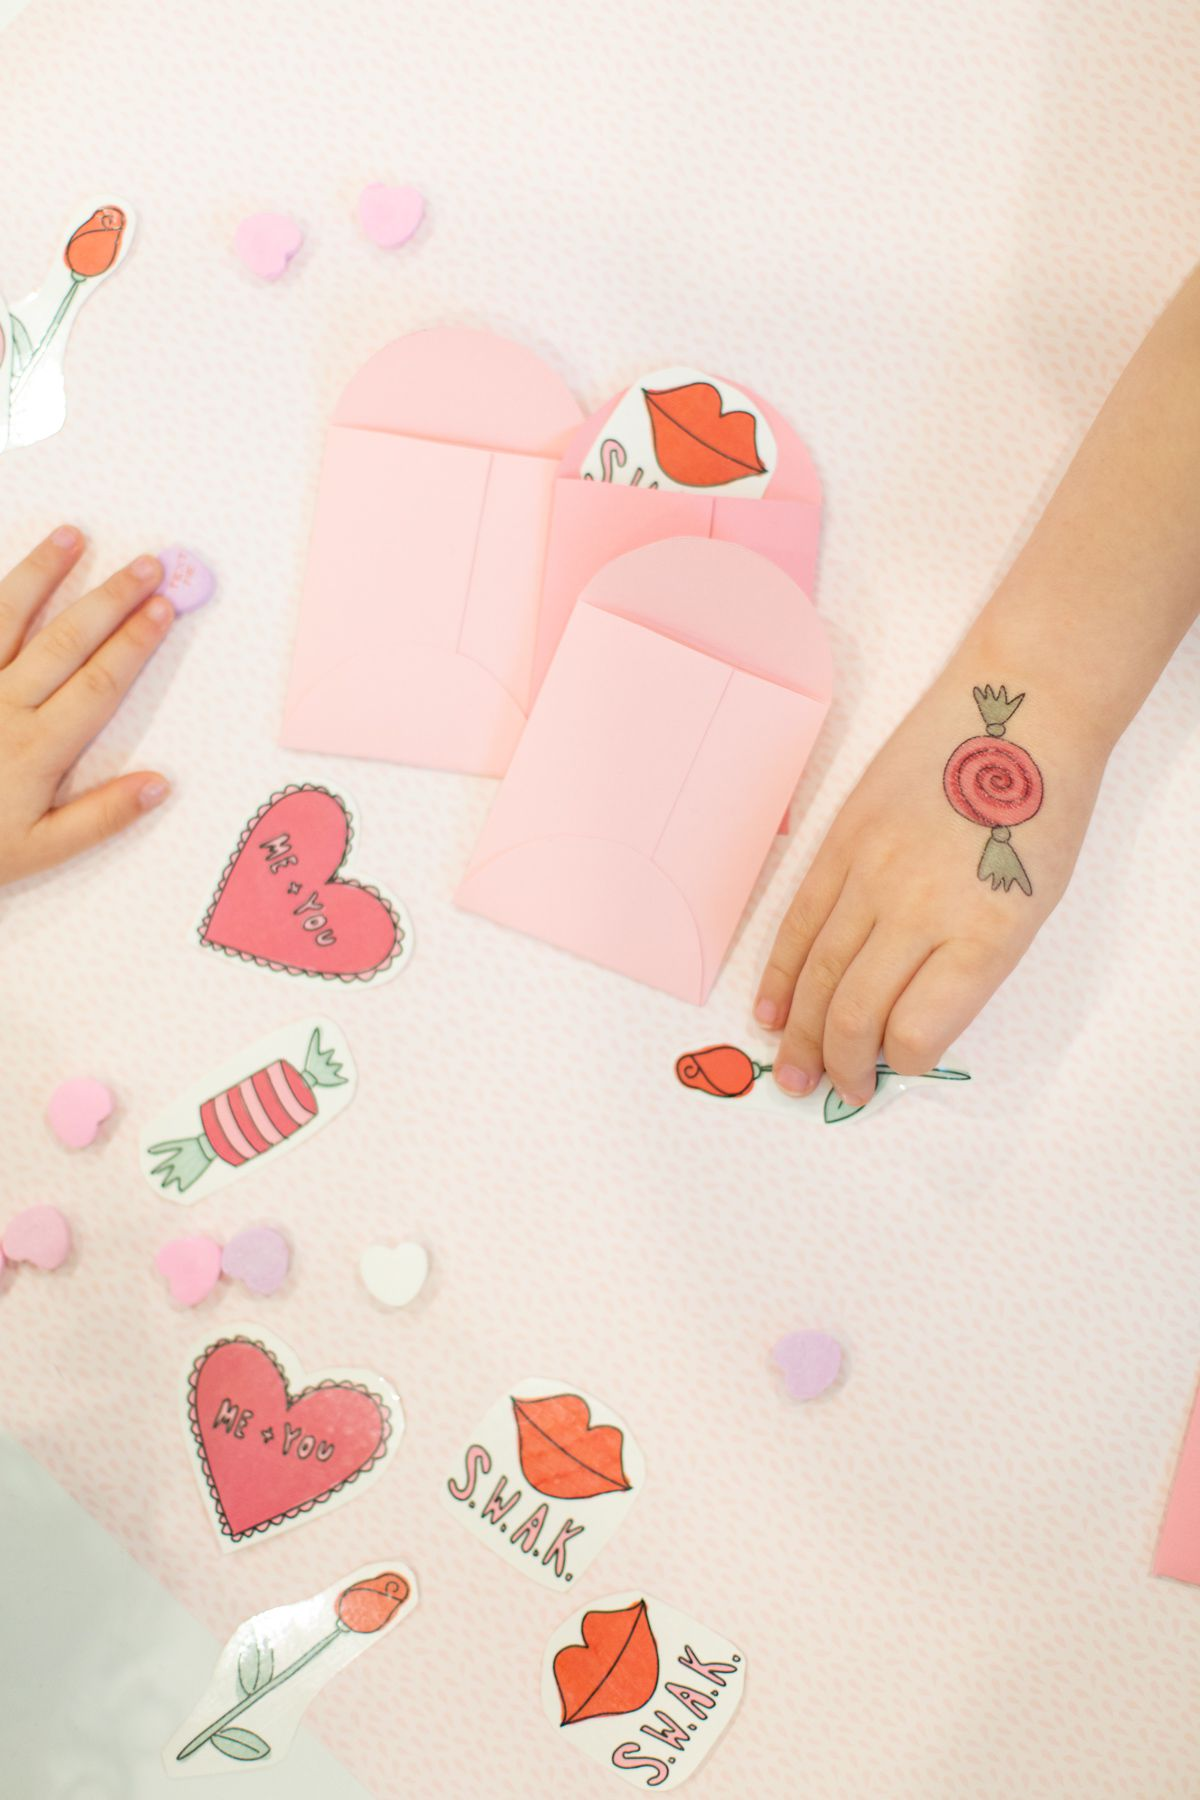 Printable Valentine's Day tattoos